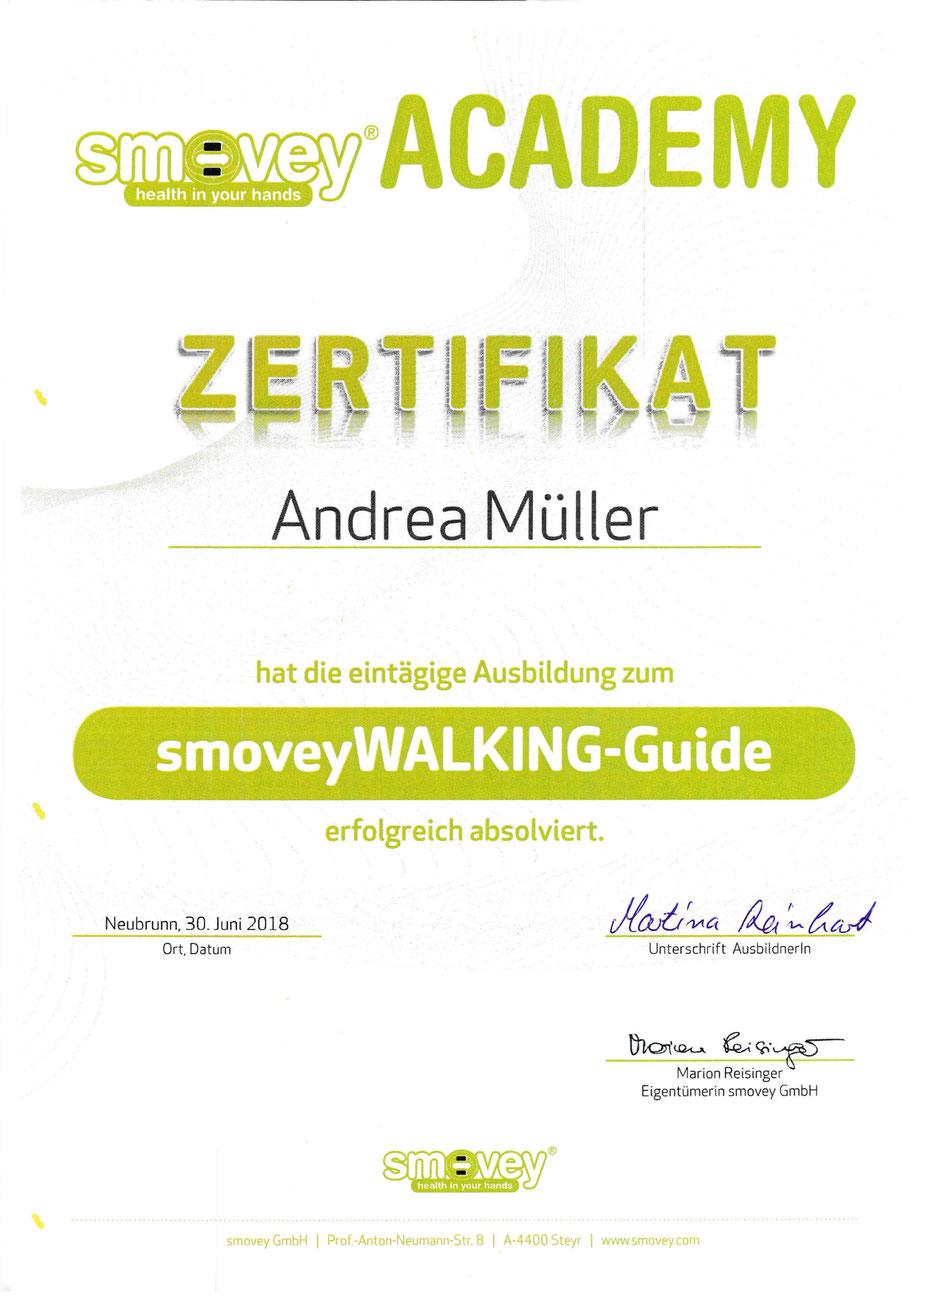 smoveyWalking-Guide